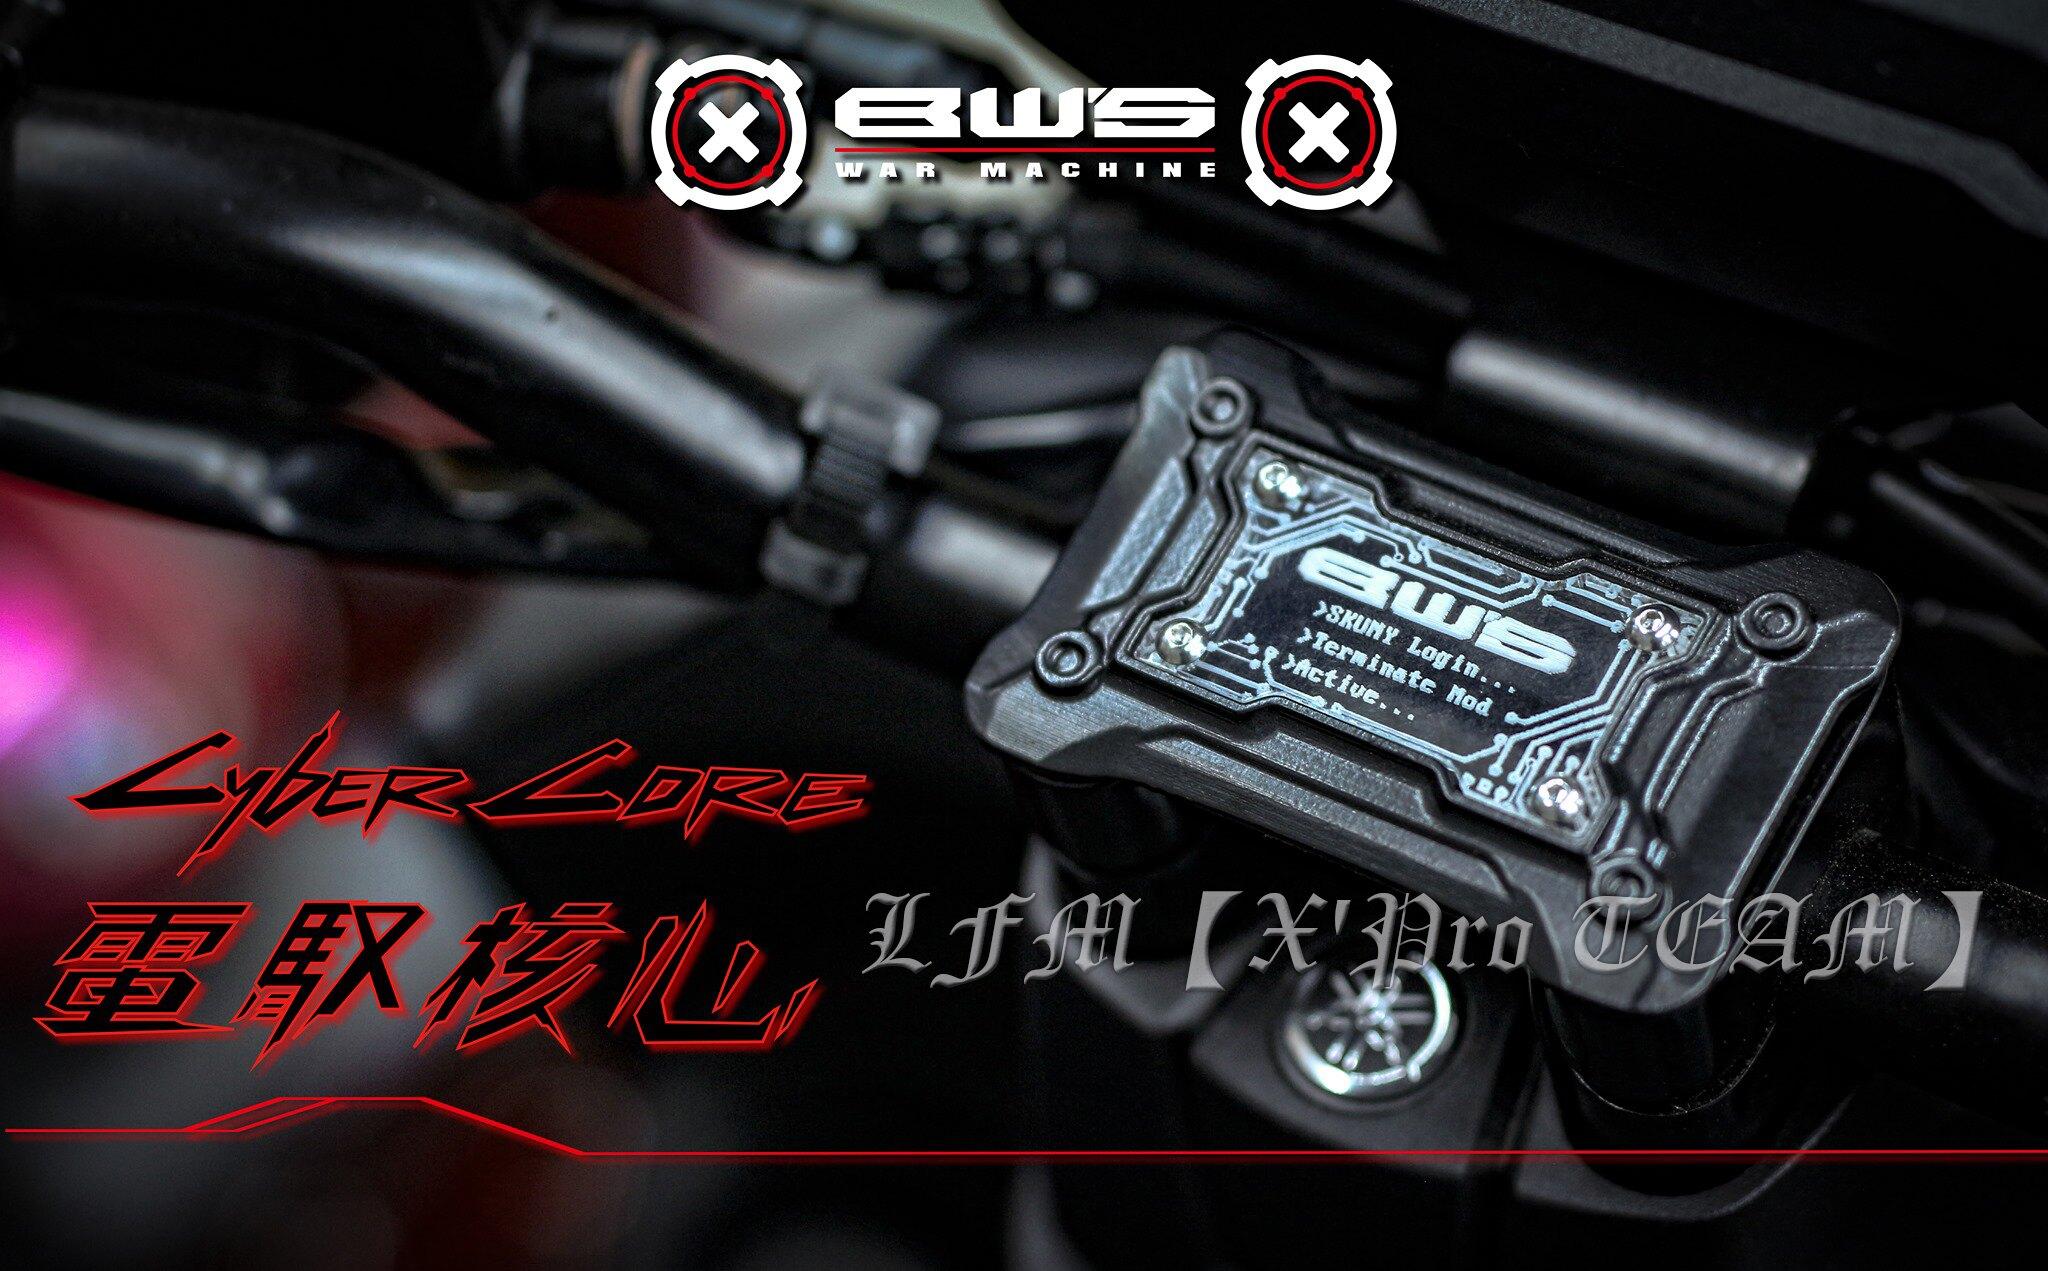 【LFM】SKUNY 電馭核心 水冷BWS 水冷大B LED 車手把飾蓋 BWS'X BWSR 把手蓋 車手蓋